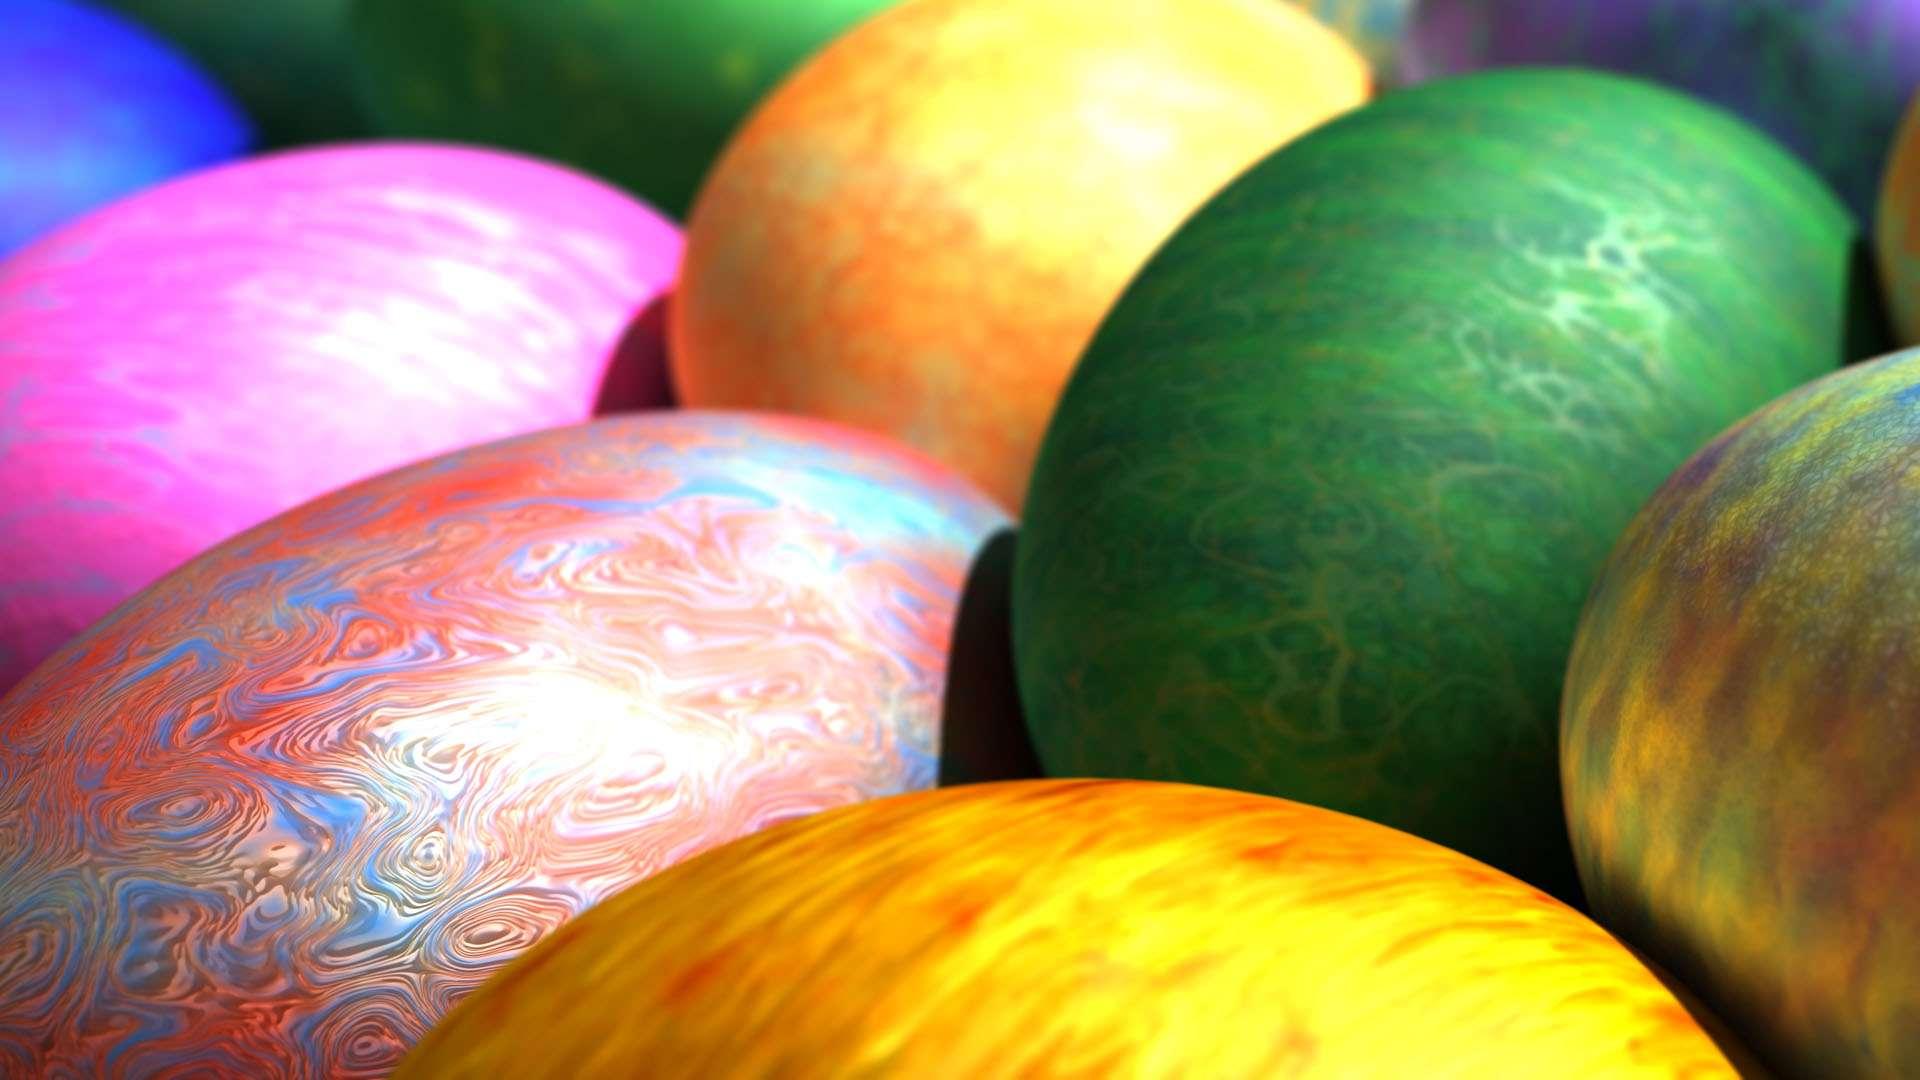 Colored Easter Eggs HD Wallpaper FullHDWpp   Full HD 1920x1080